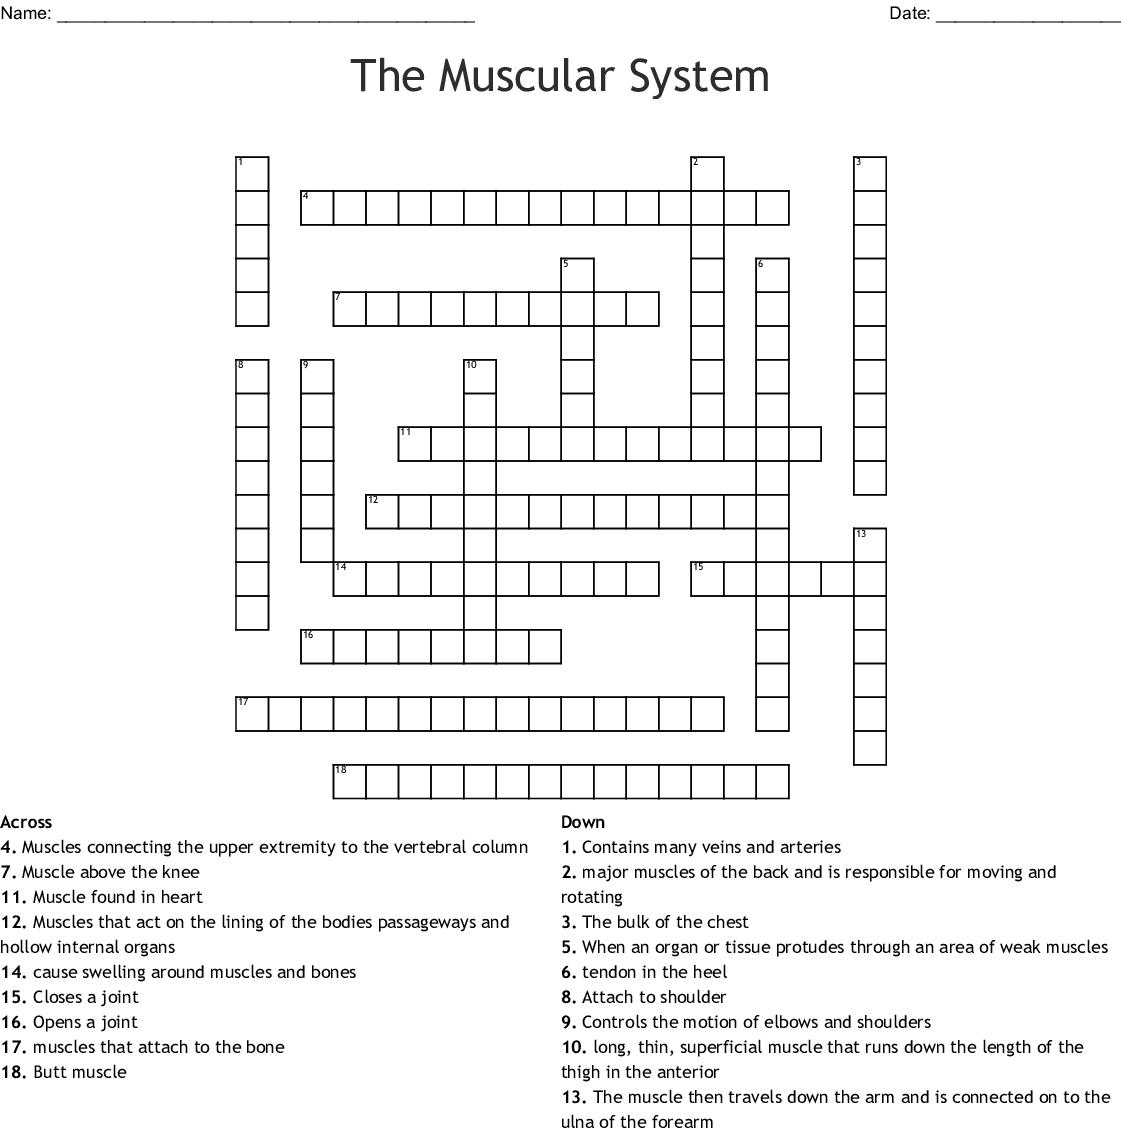 Skeletal Muscular System Crossword